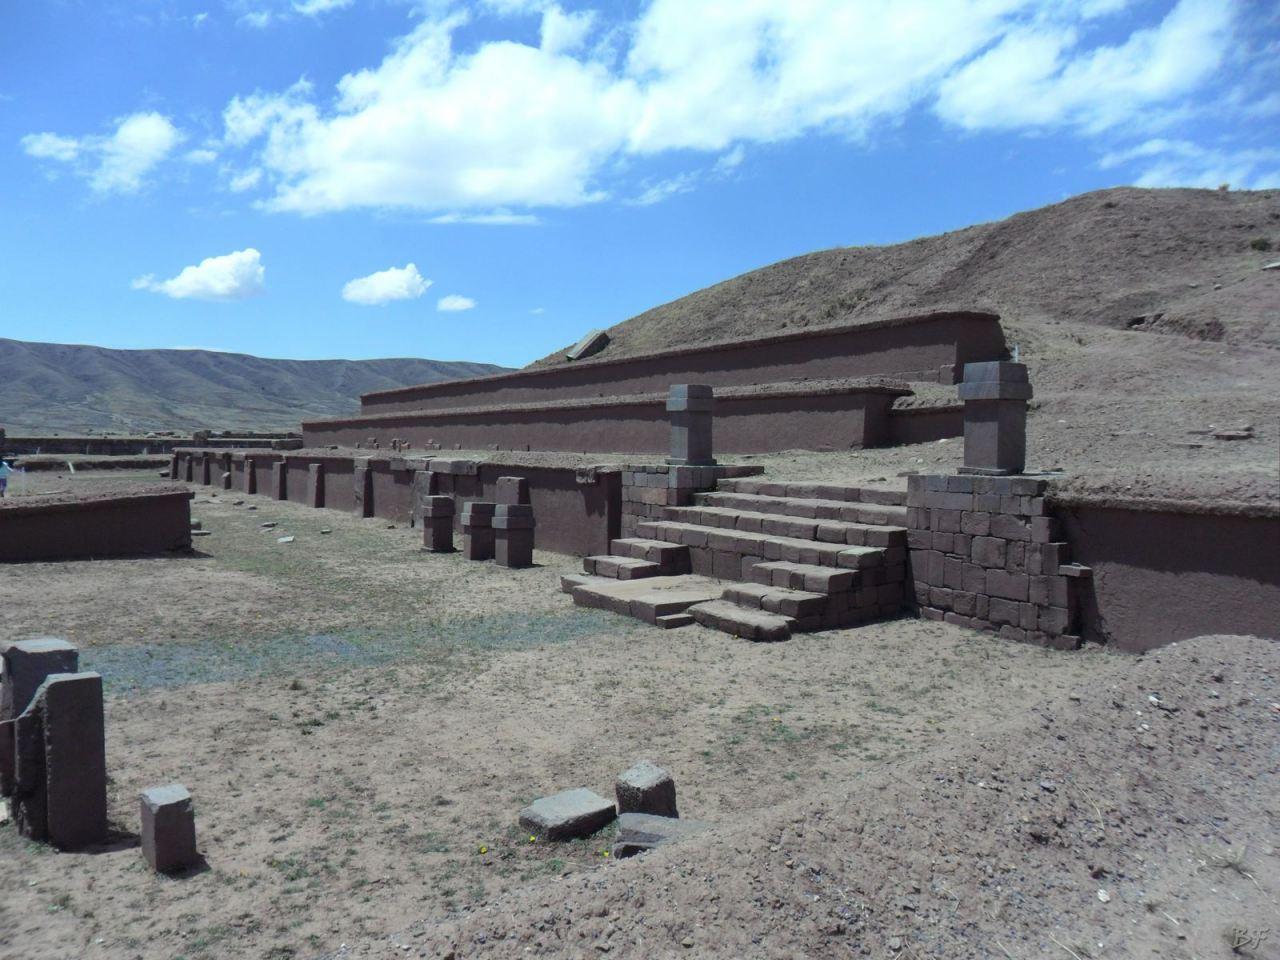 Sito-Megalitico-Piramide-Akapana-Kalasasaya-Menhir-Tiahuanaco-Bolivia-2